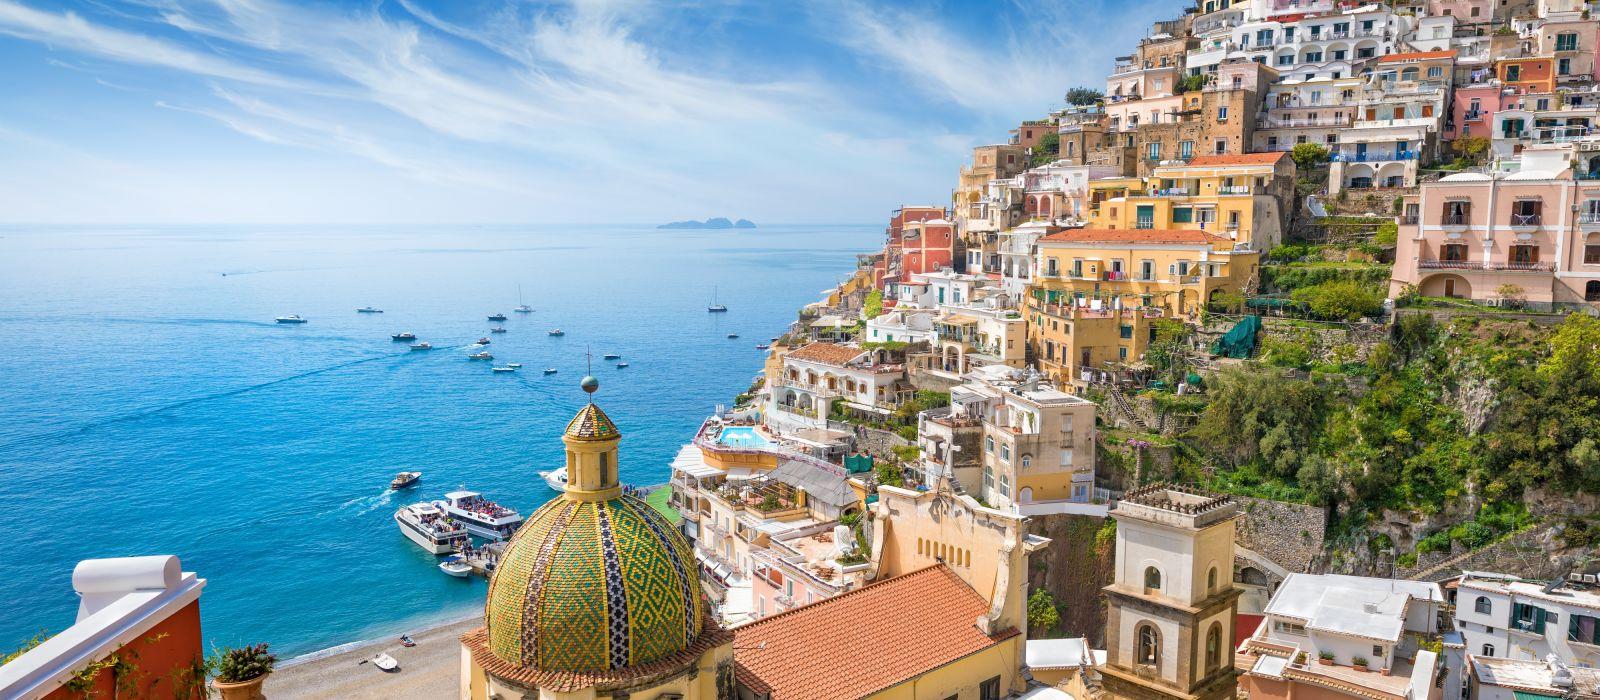 Destination Amalfi Coast Italy